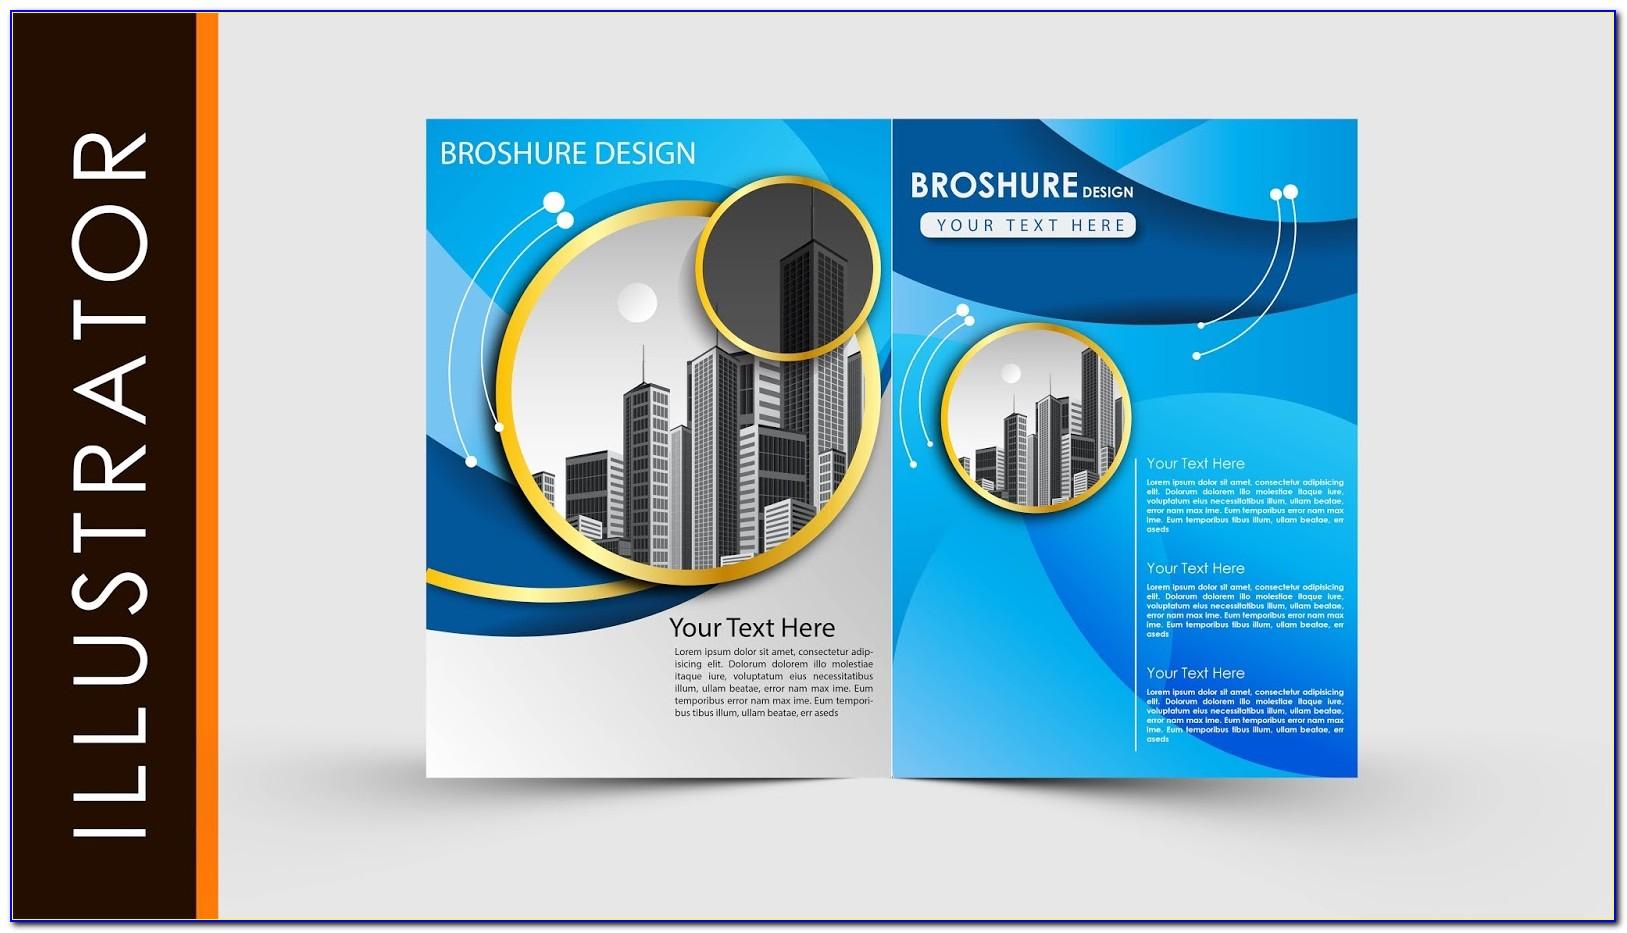 Adobe Illustrator Flyer Templates Free Download